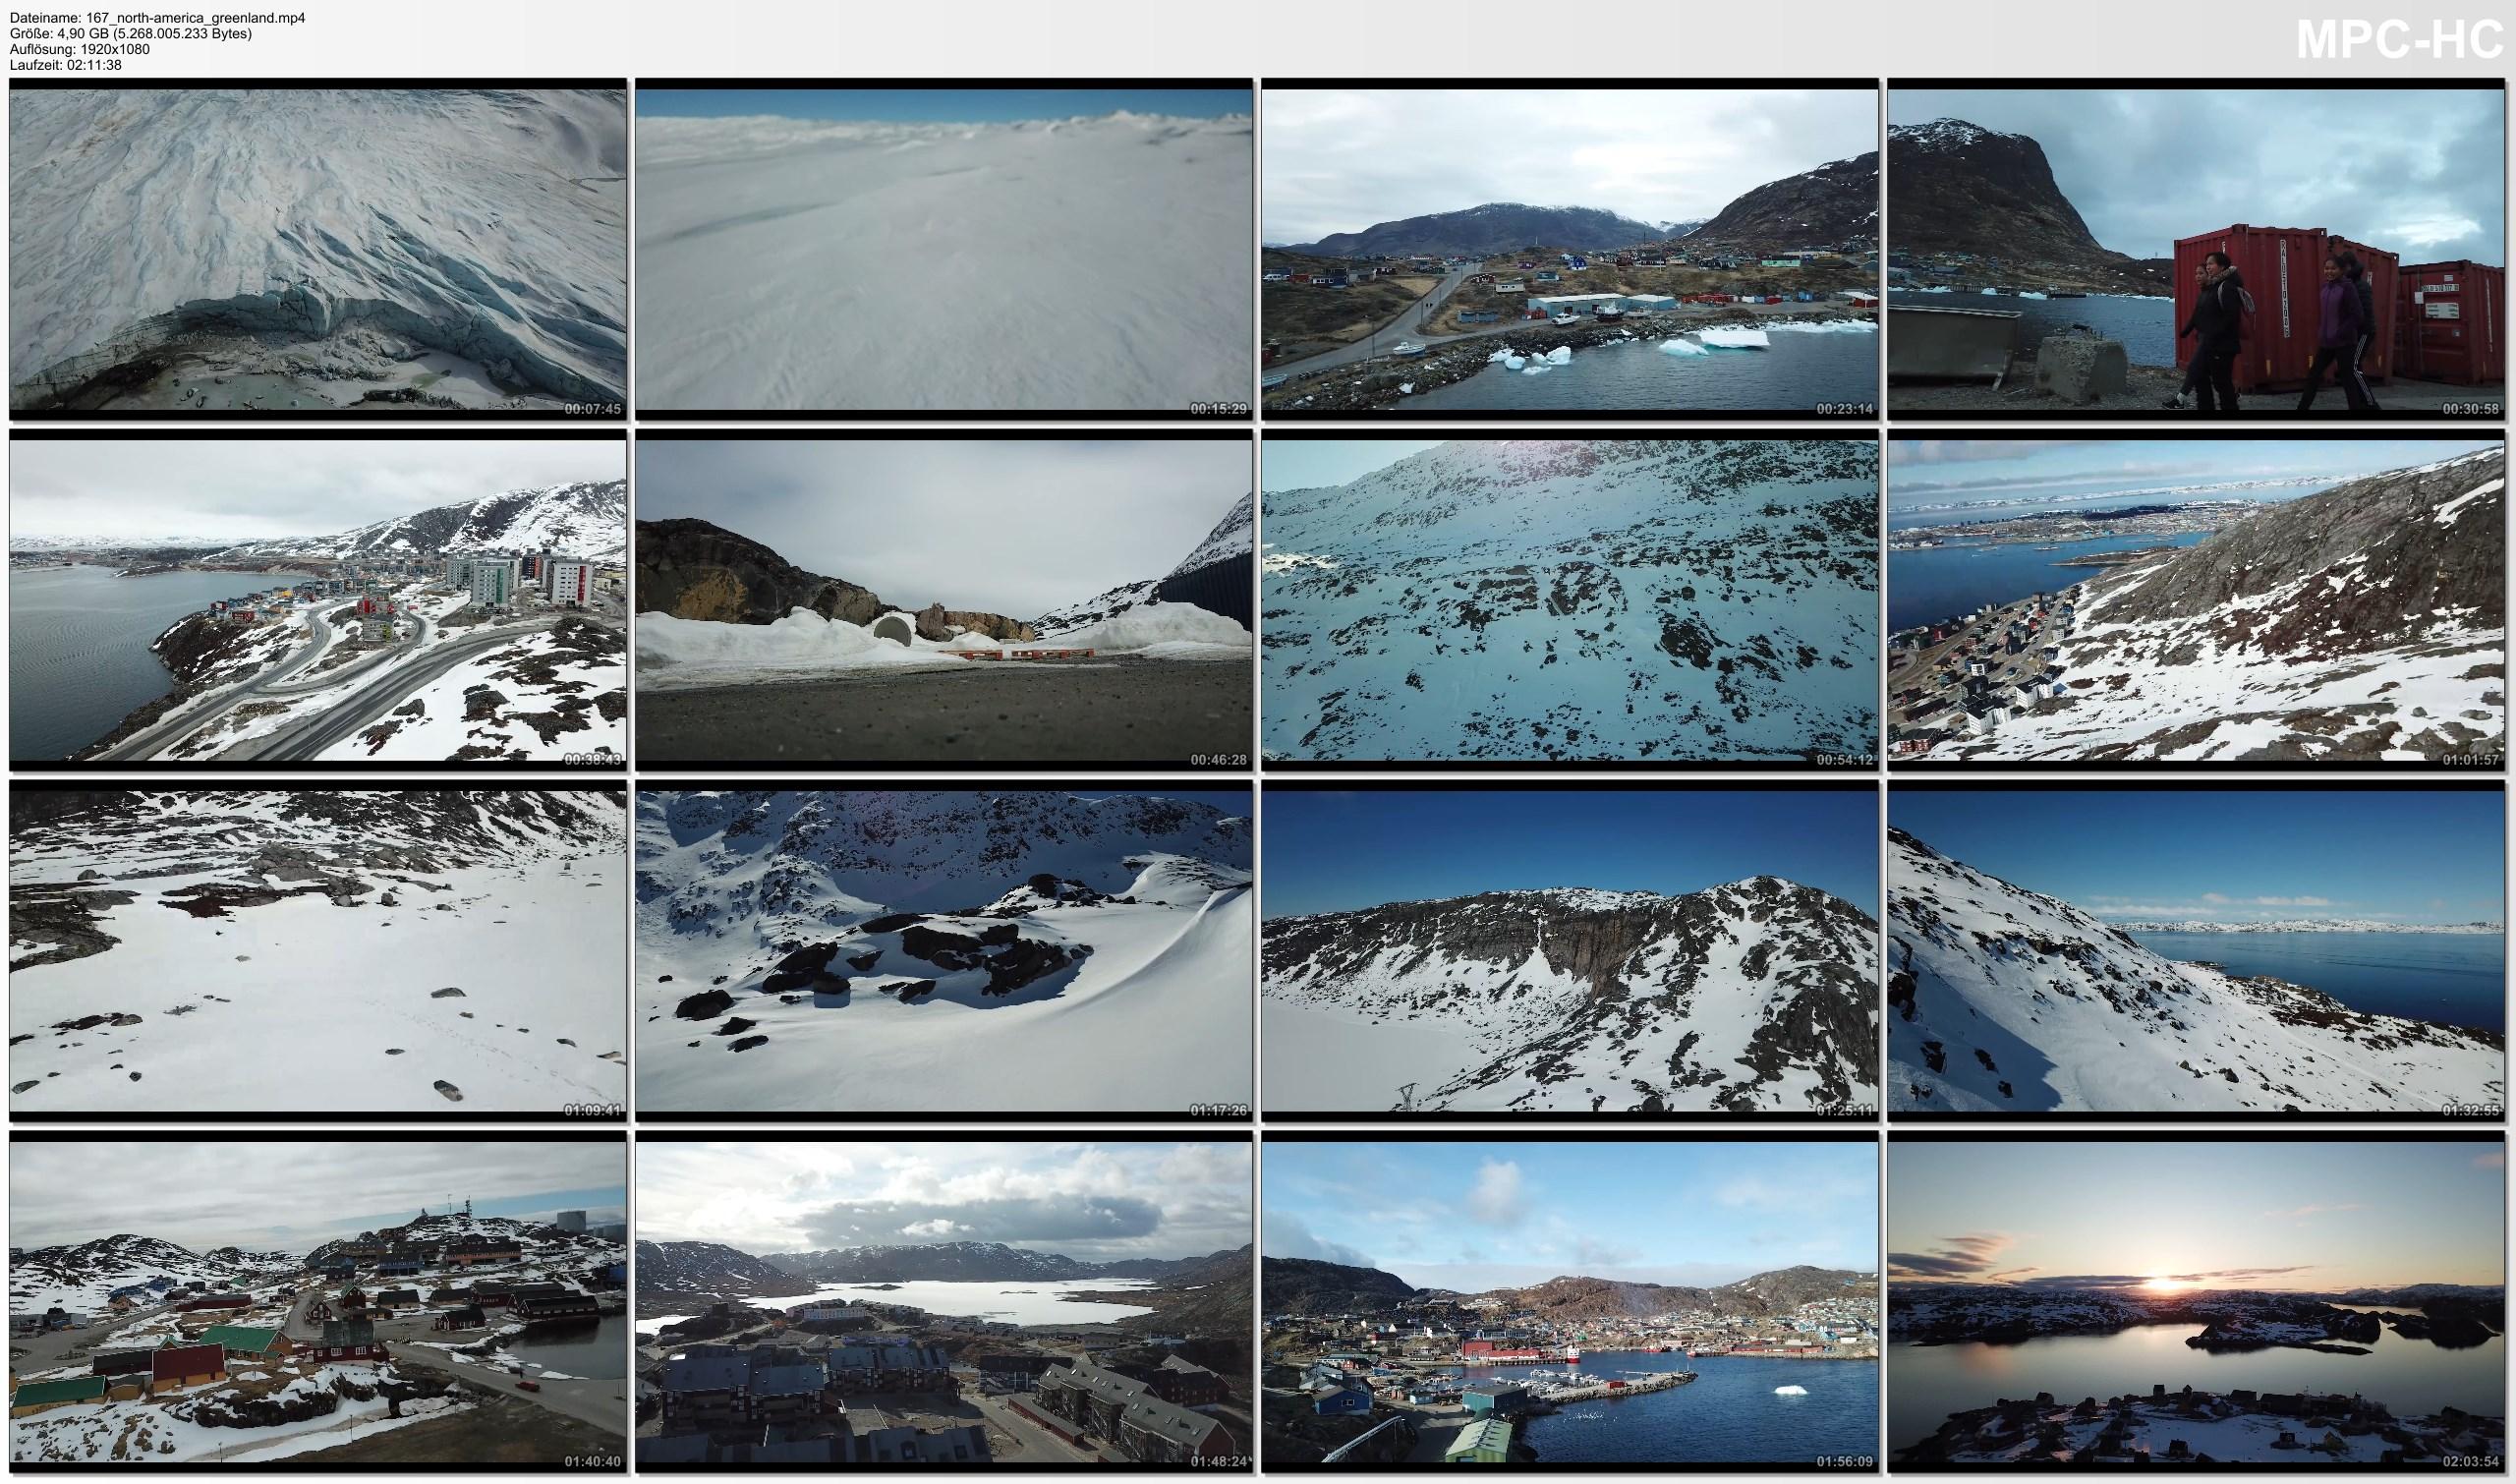 Drone Pictures from Video 【4K】Drone RAW Footage | GREENLAND 2019 ..:: Nuuk :: Qaqortoq :: Kangerlussuaq | UltraHD Stock Video